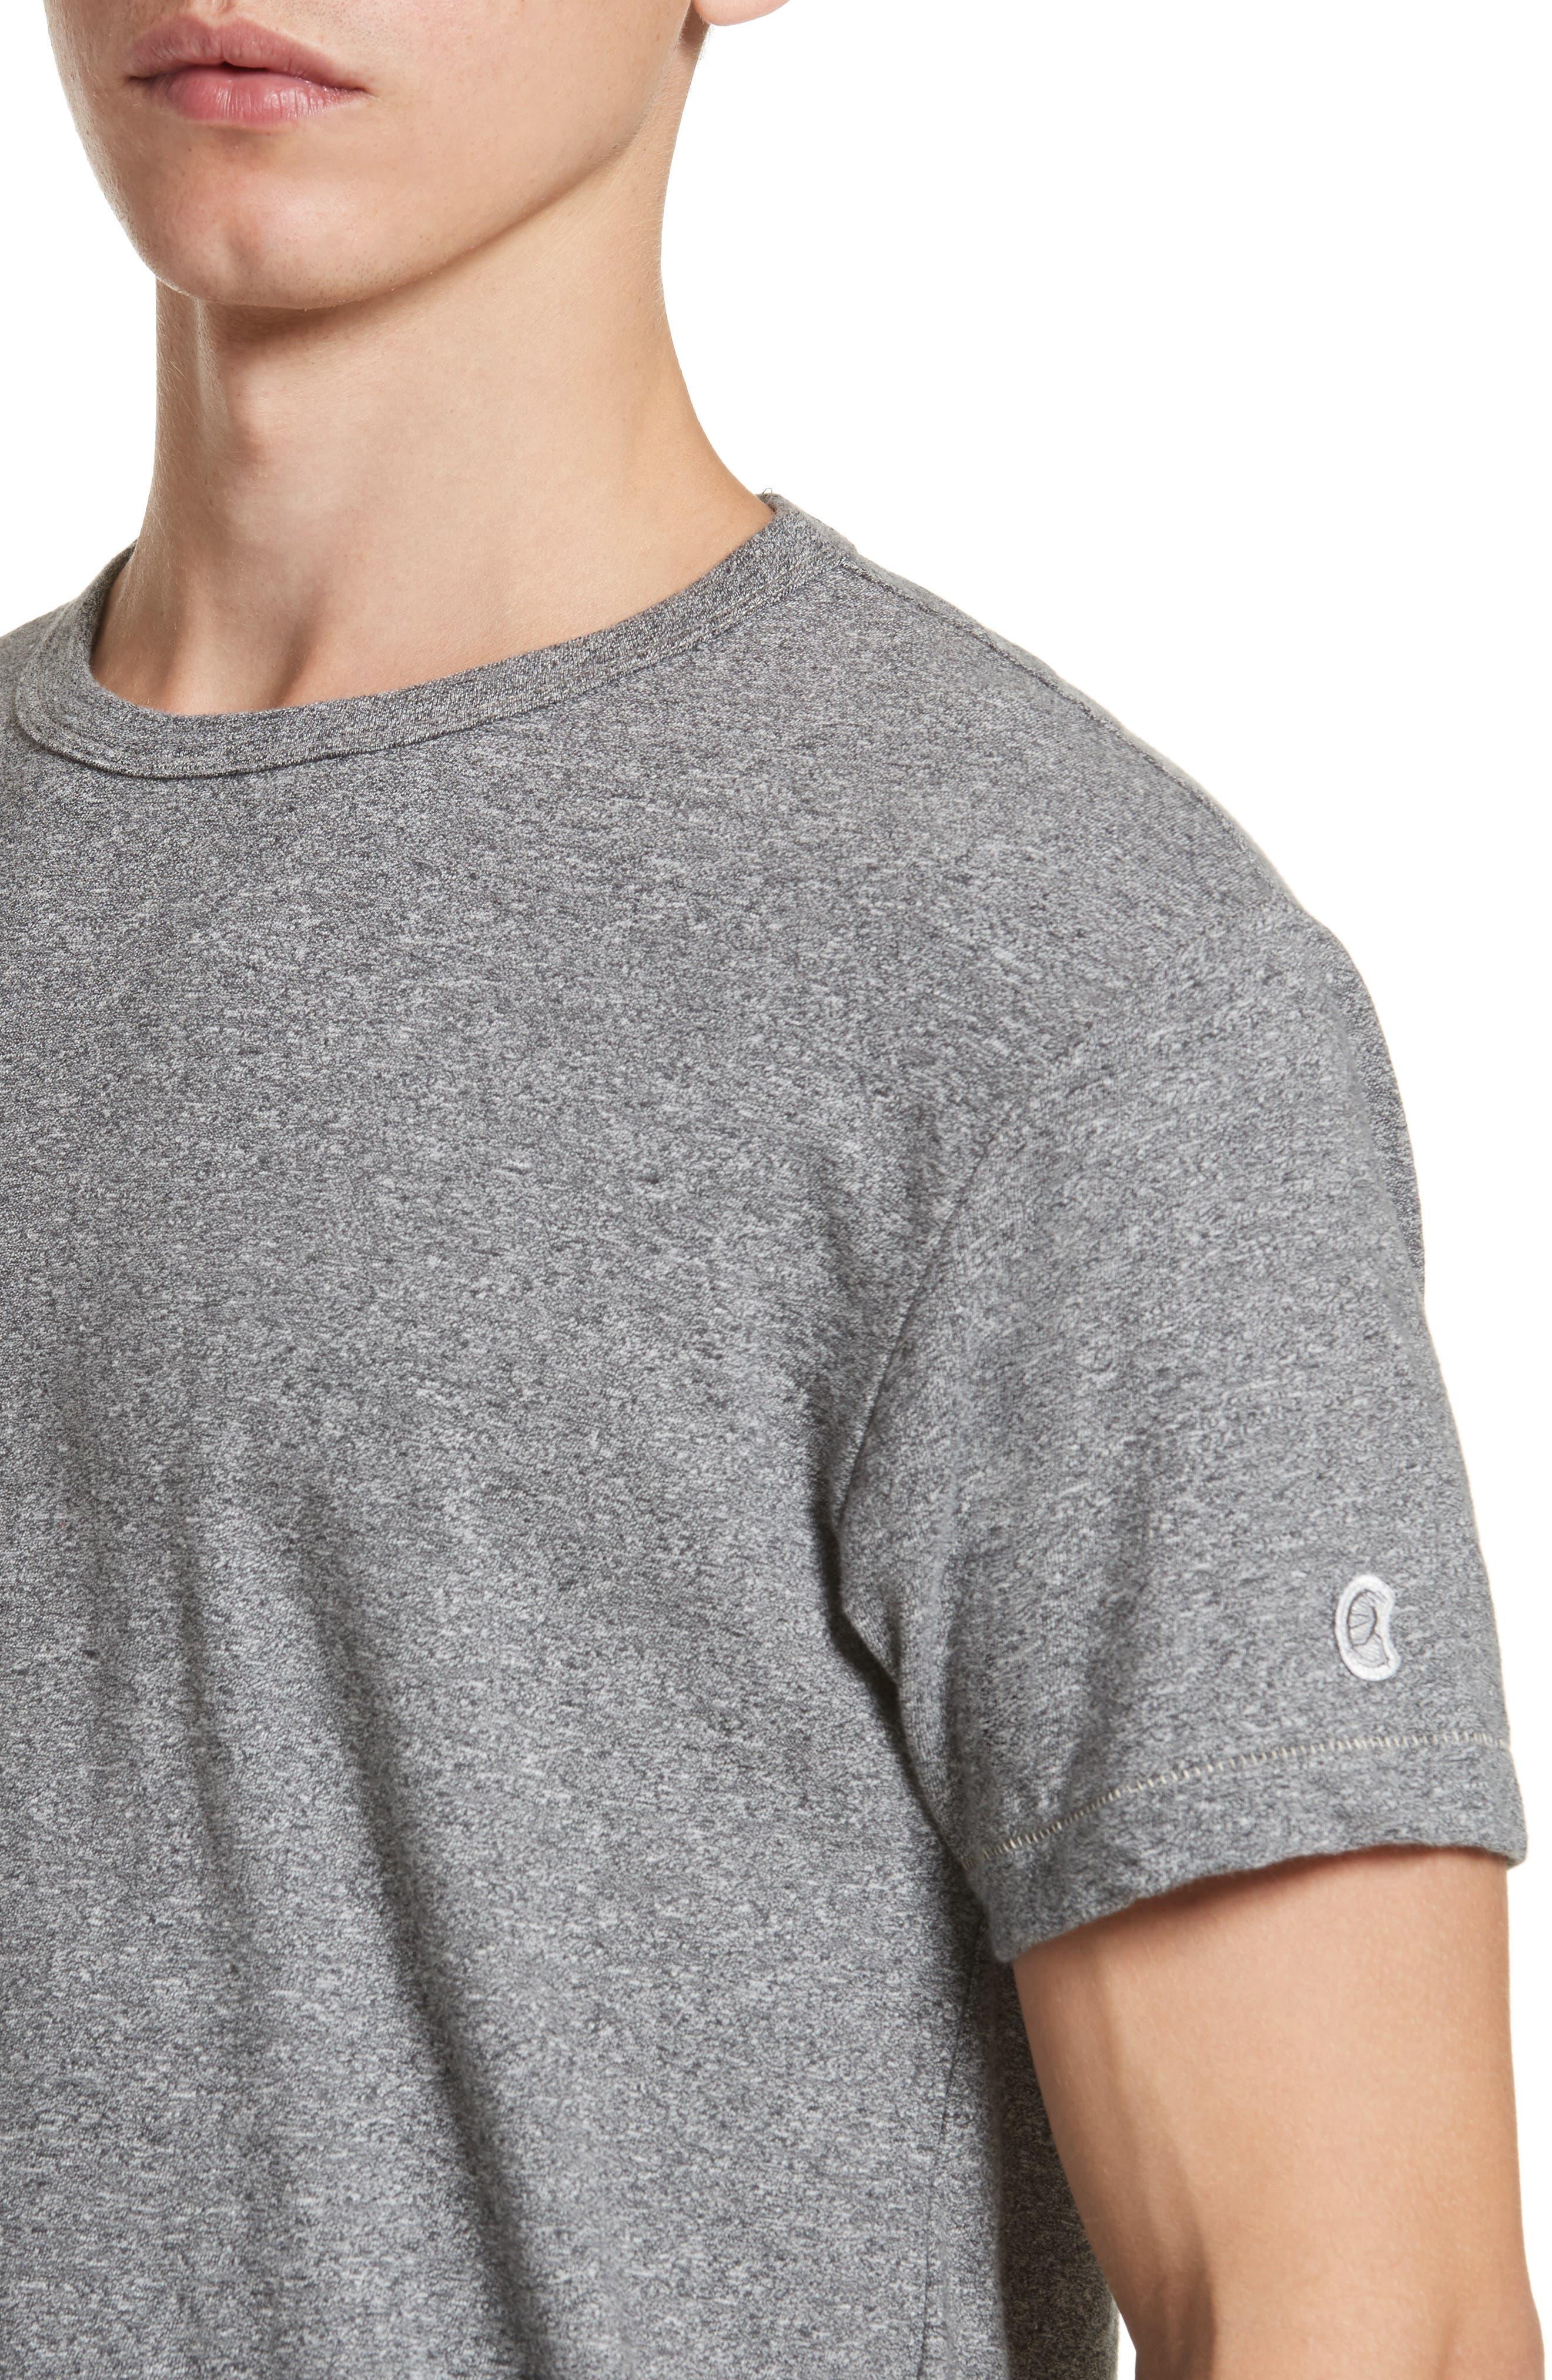 Alternate Image 4  - Todd Snyder + Champion Heathered Crewneck T-Shirt